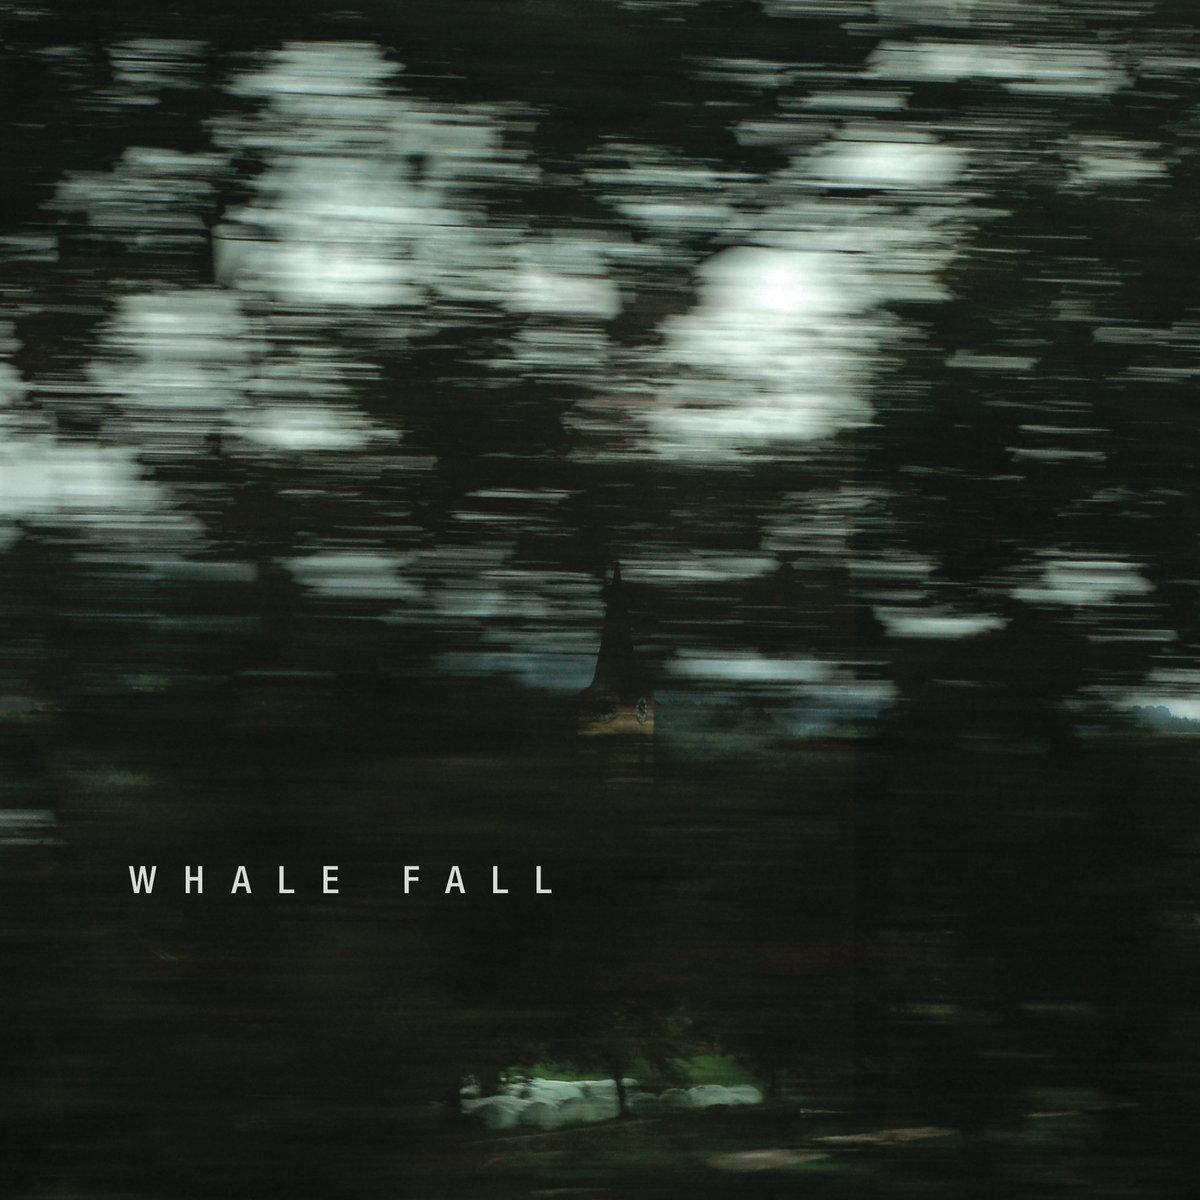 You Go Up, I Go Down | Whale Fall